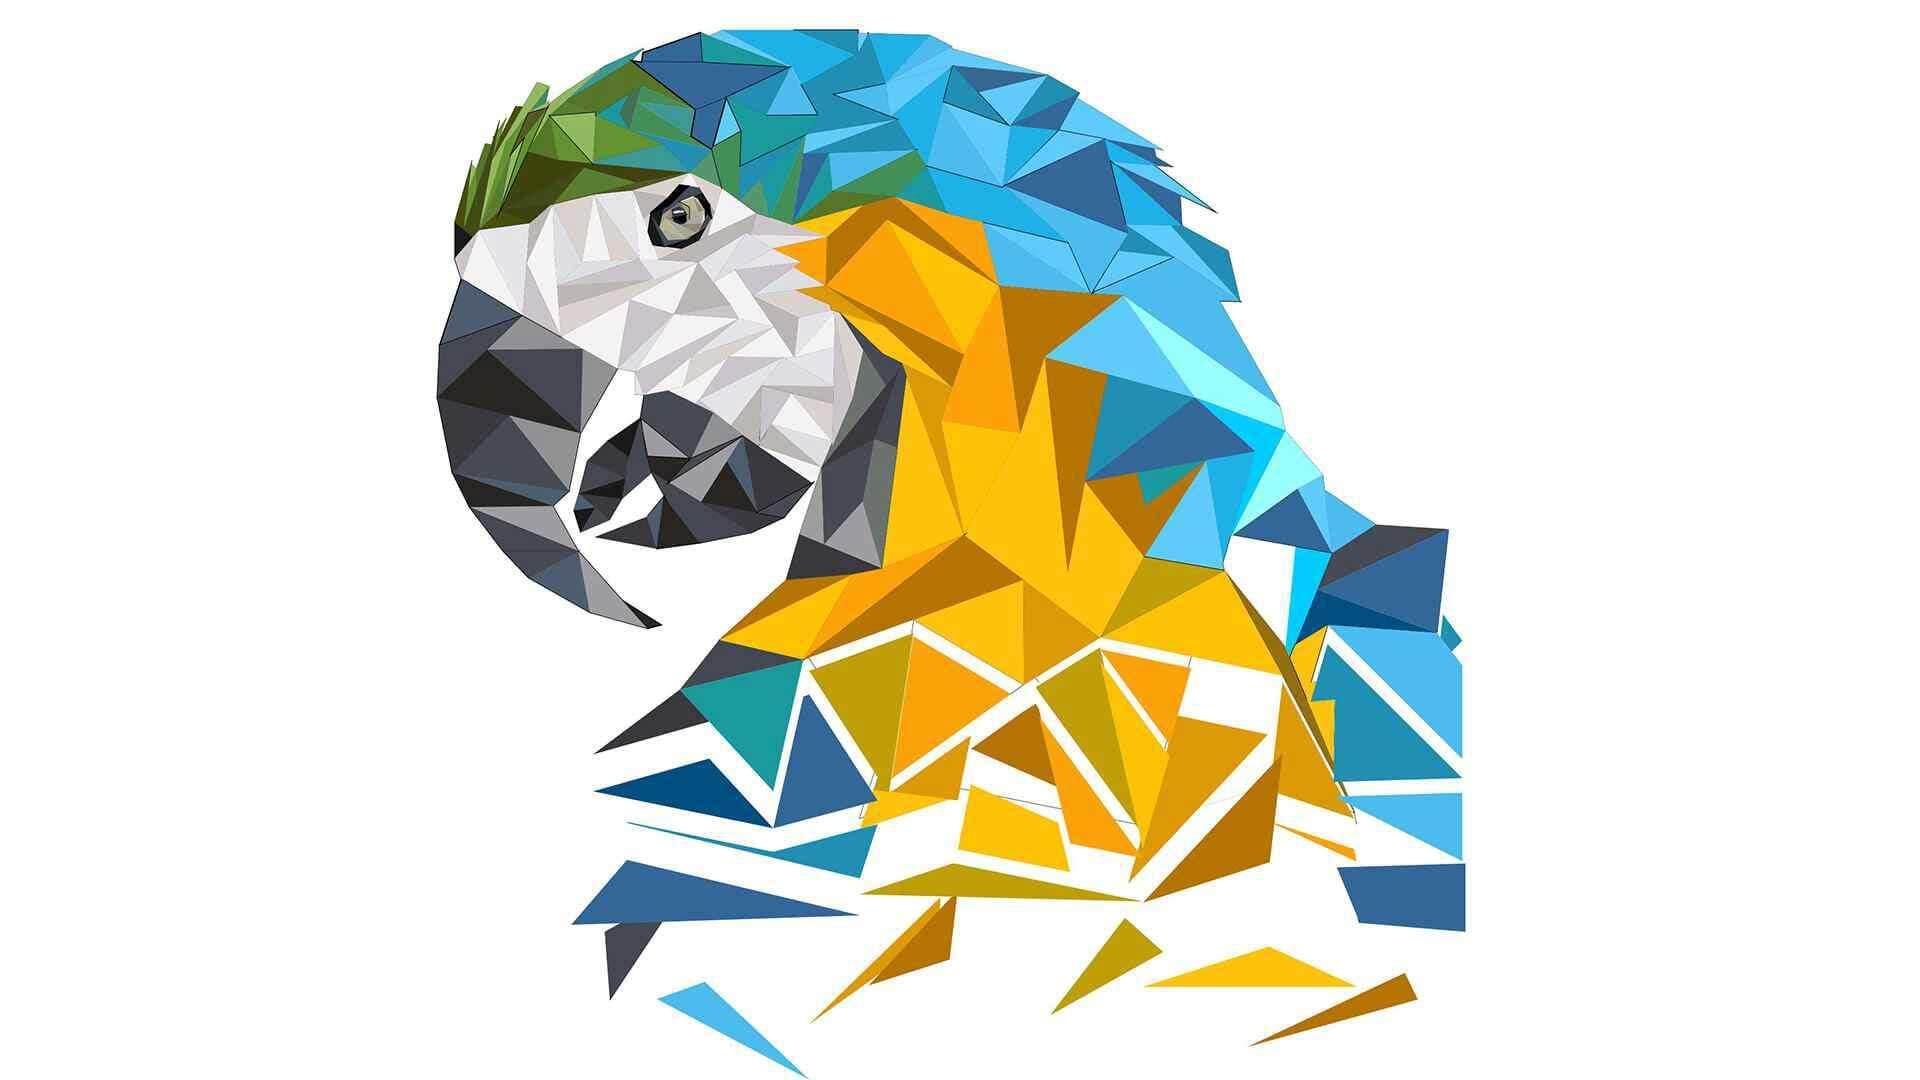 exploding-parrot